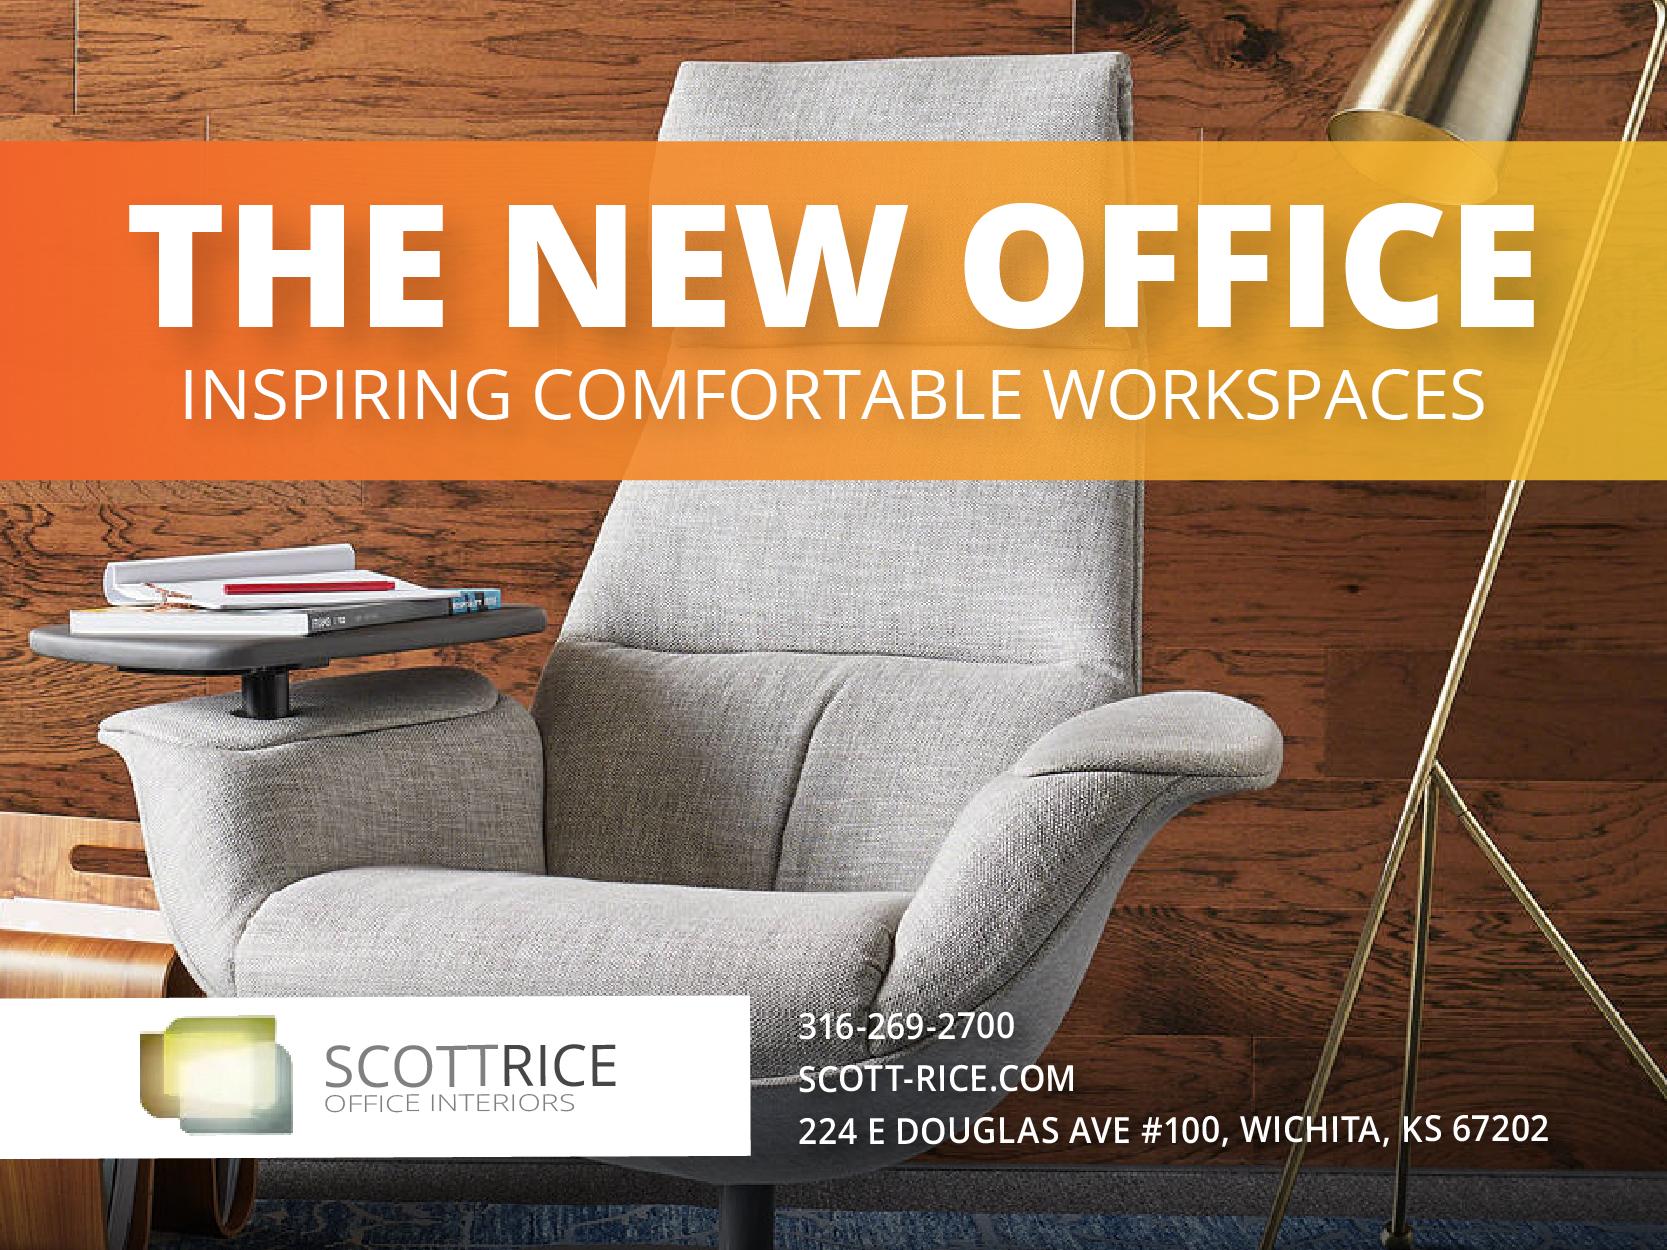 SR_Inpire Comfortable Workspaces_Email Blast-01